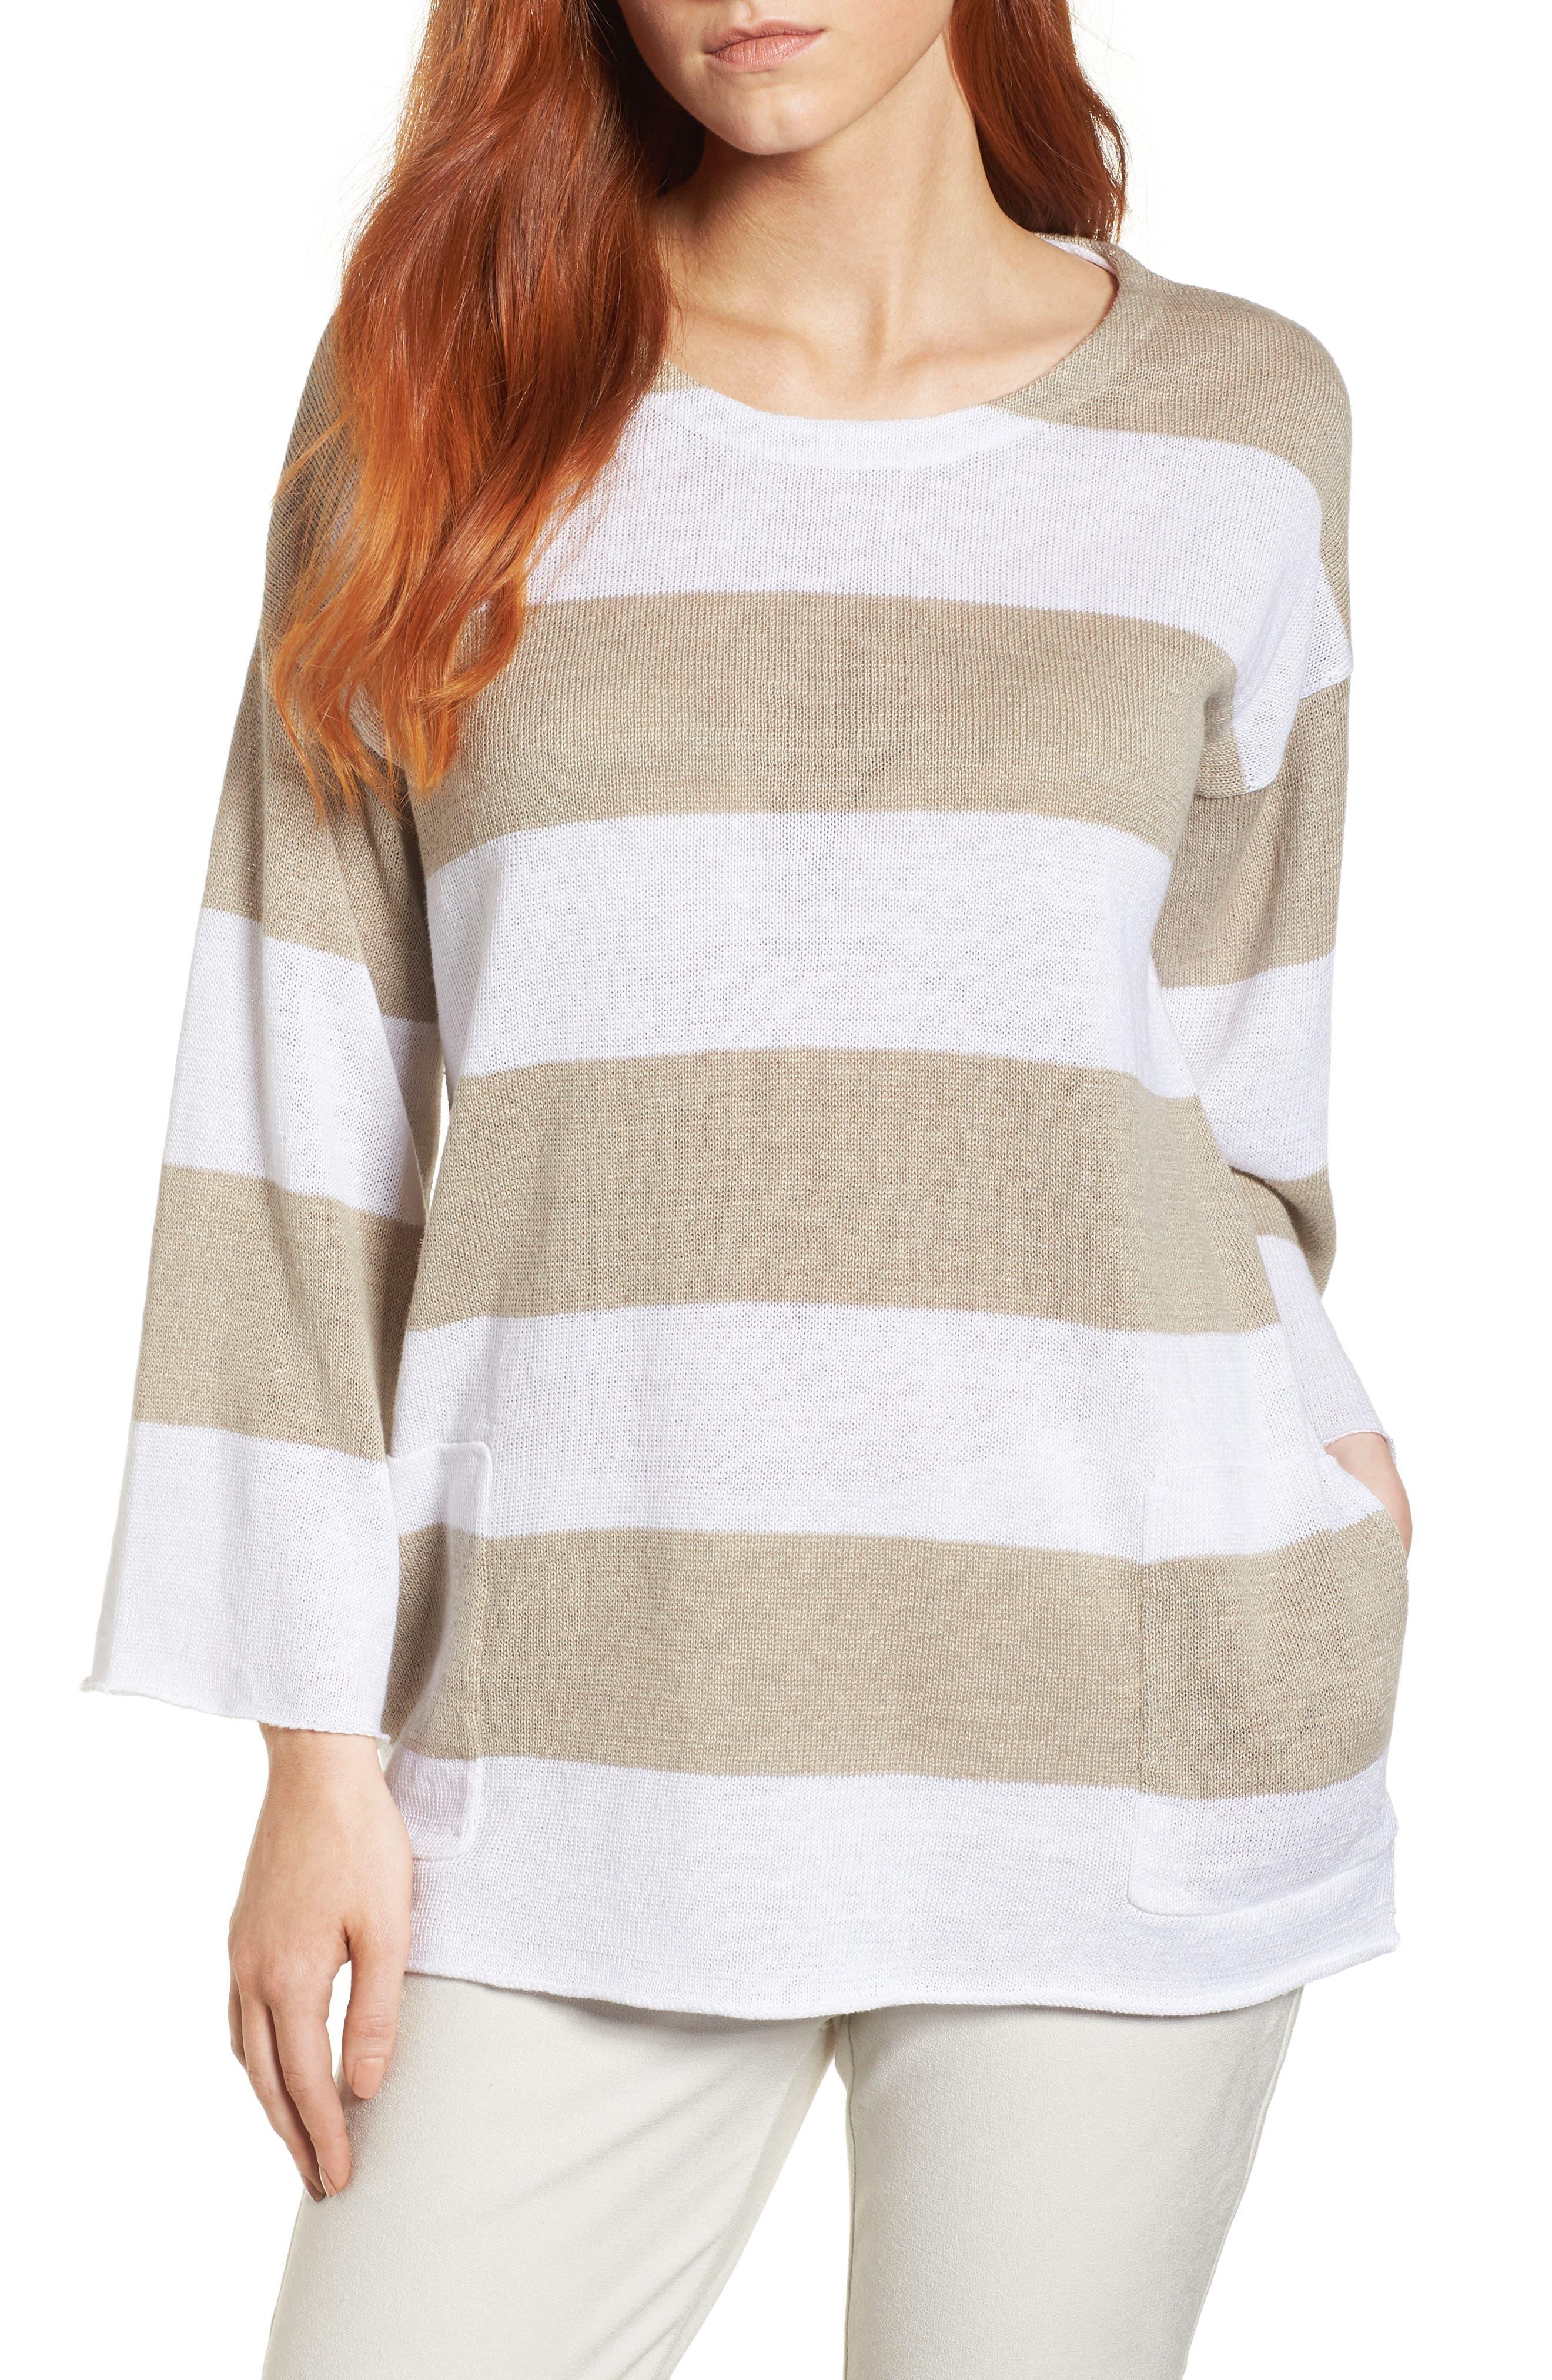 Stripe Organic Linen Knit A-Line Top,                             Main thumbnail 1, color,                             White/ Natural